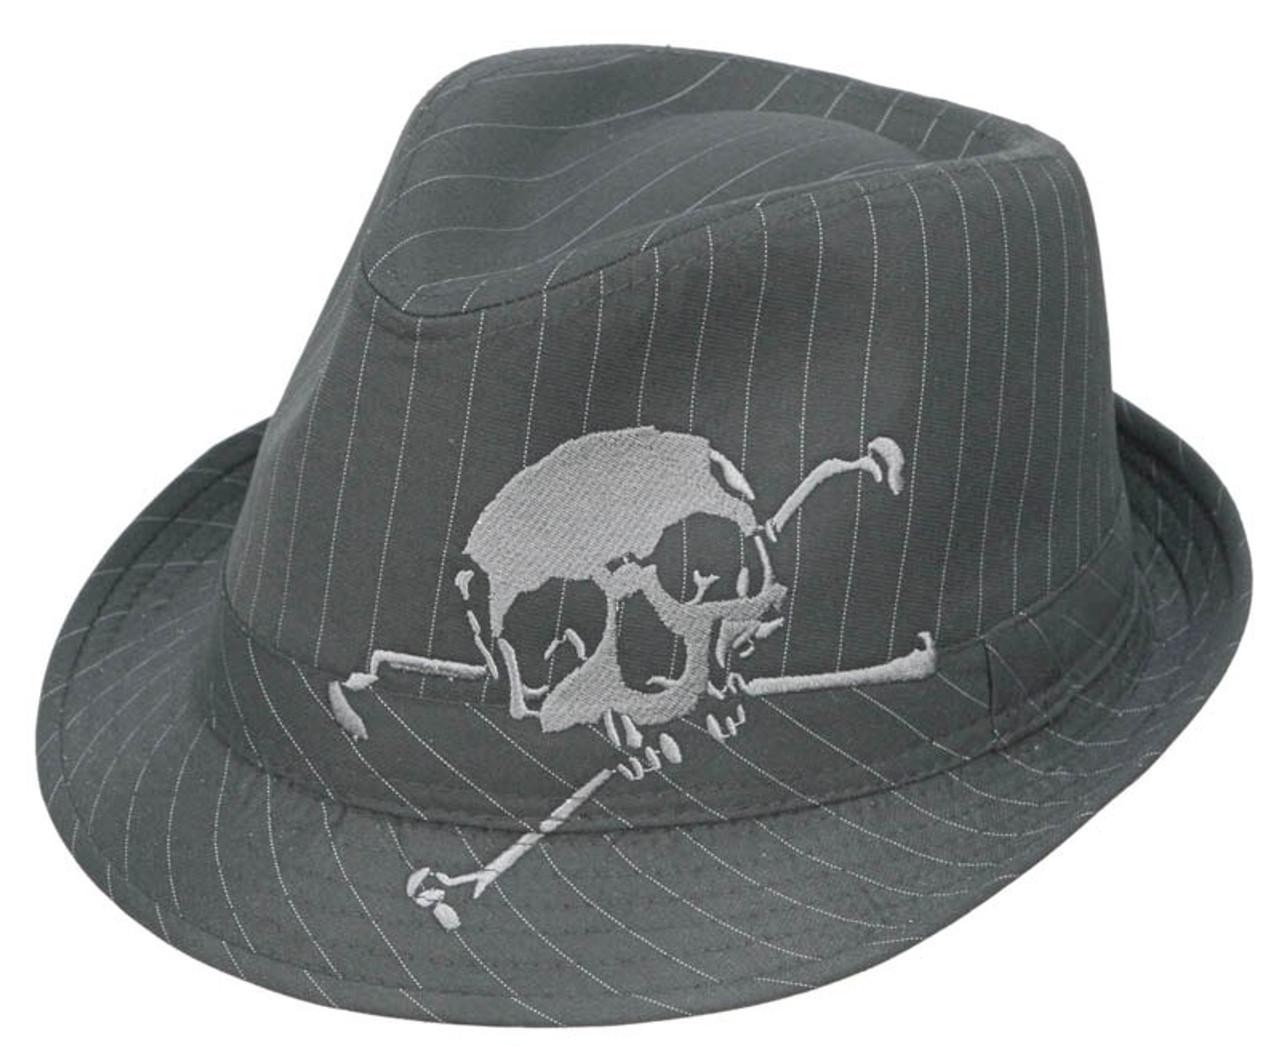 b122bfa8bf8f1 Kenny K | Skull Embroidered Fedora Hat | Hats Unlimited